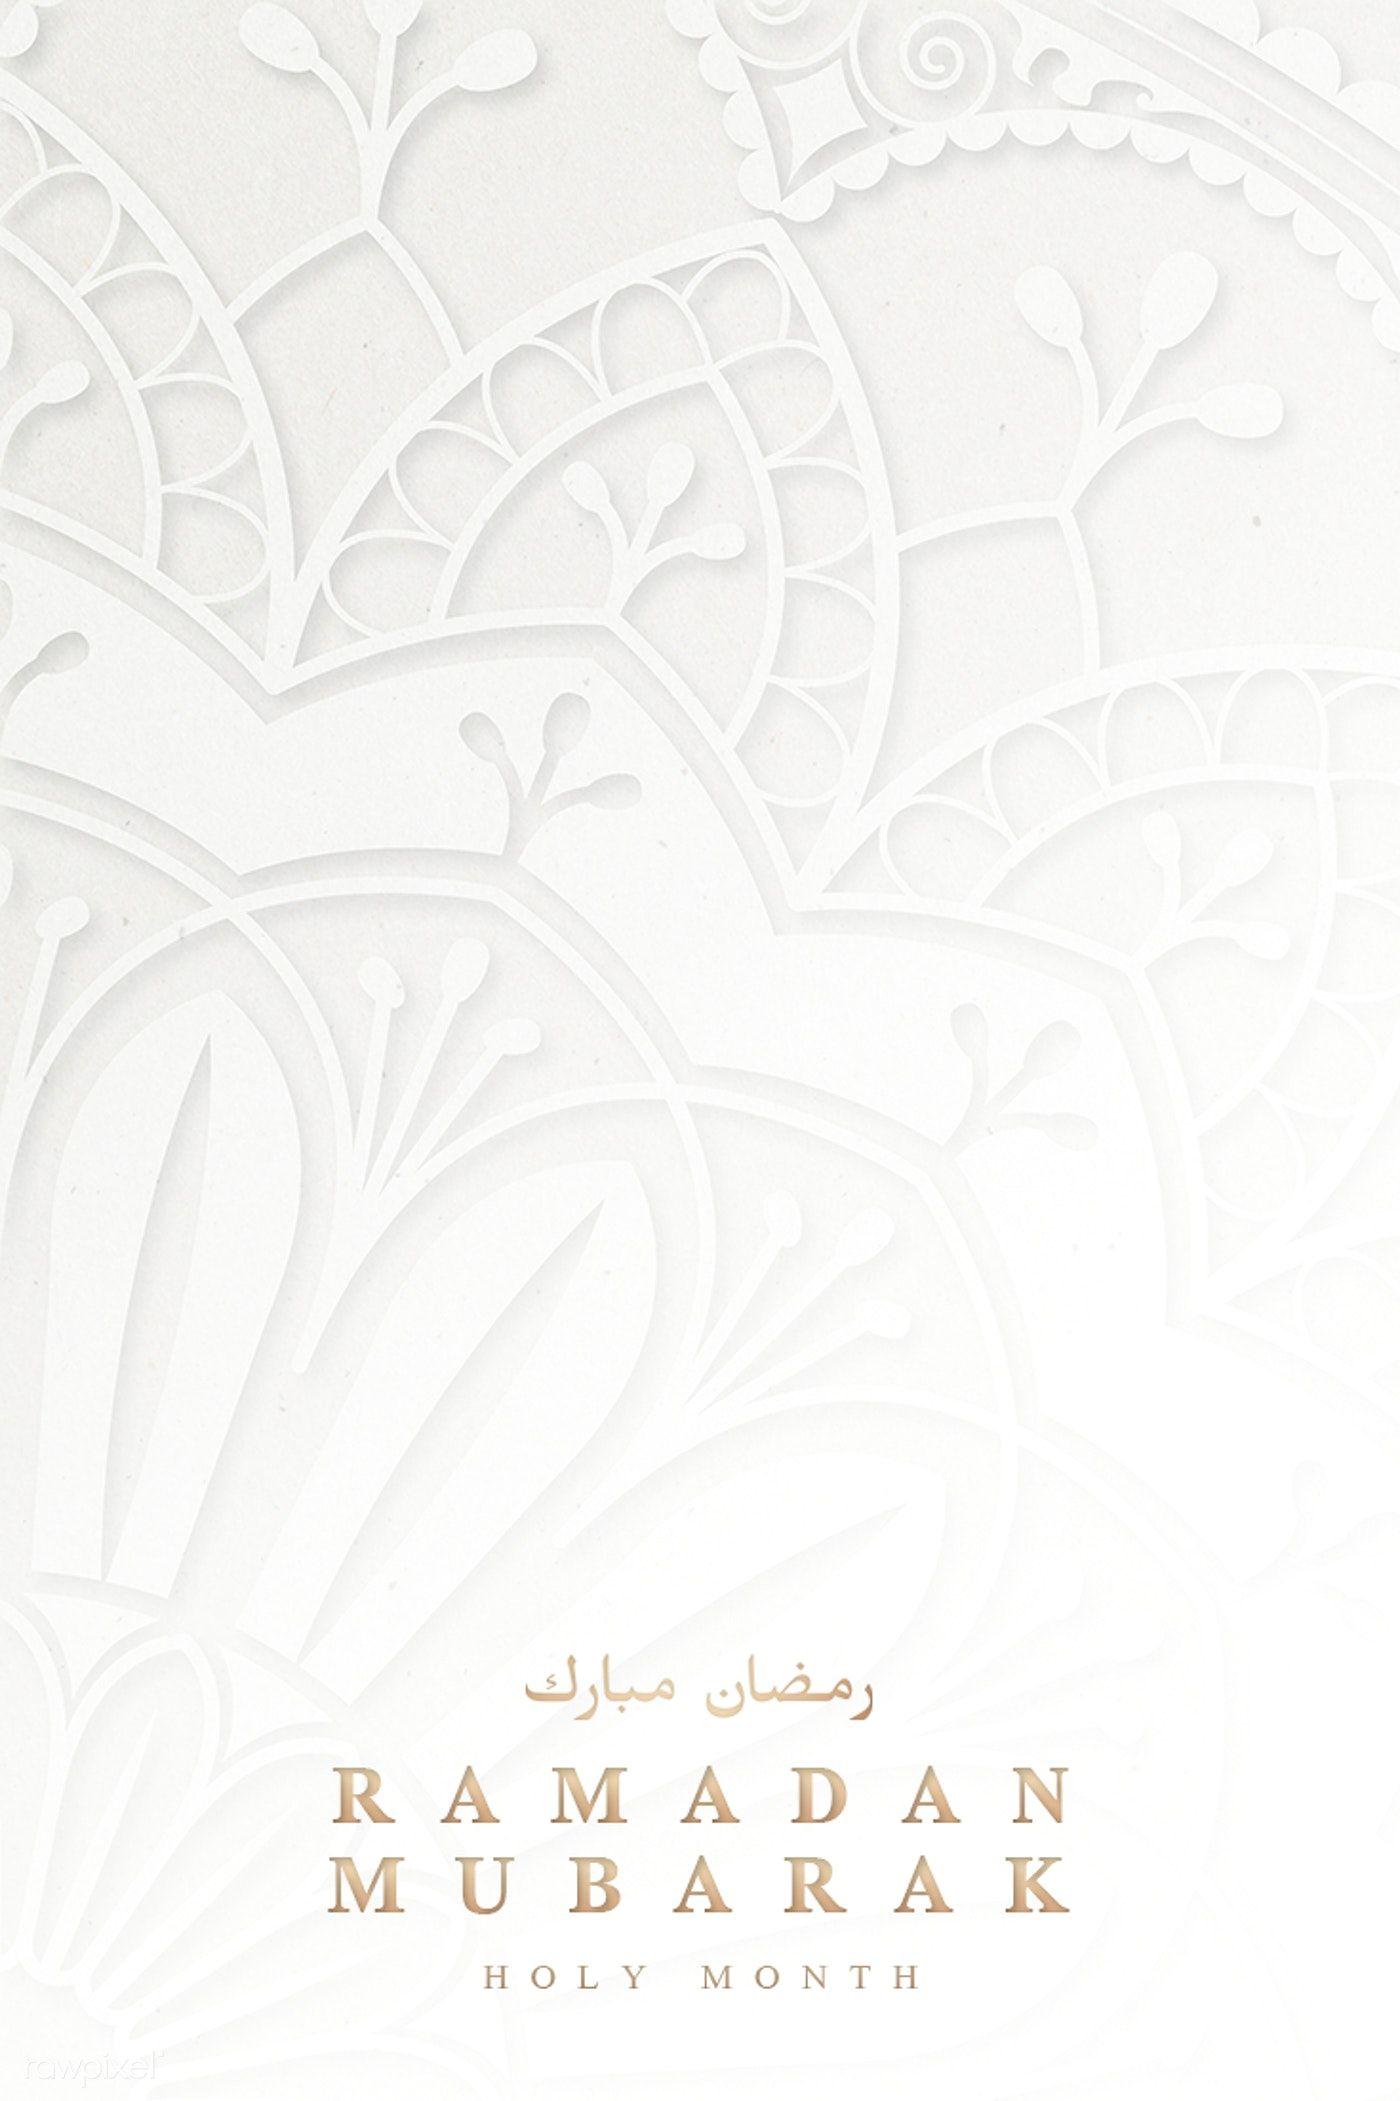 Festive Ramadan Mubarak Blessing Card Template Free Image By Rawpixel Com Manotang In 2020 Eid Mubarak Greeting Cards Eid Mubarak Greetings Eid Mubarak Card